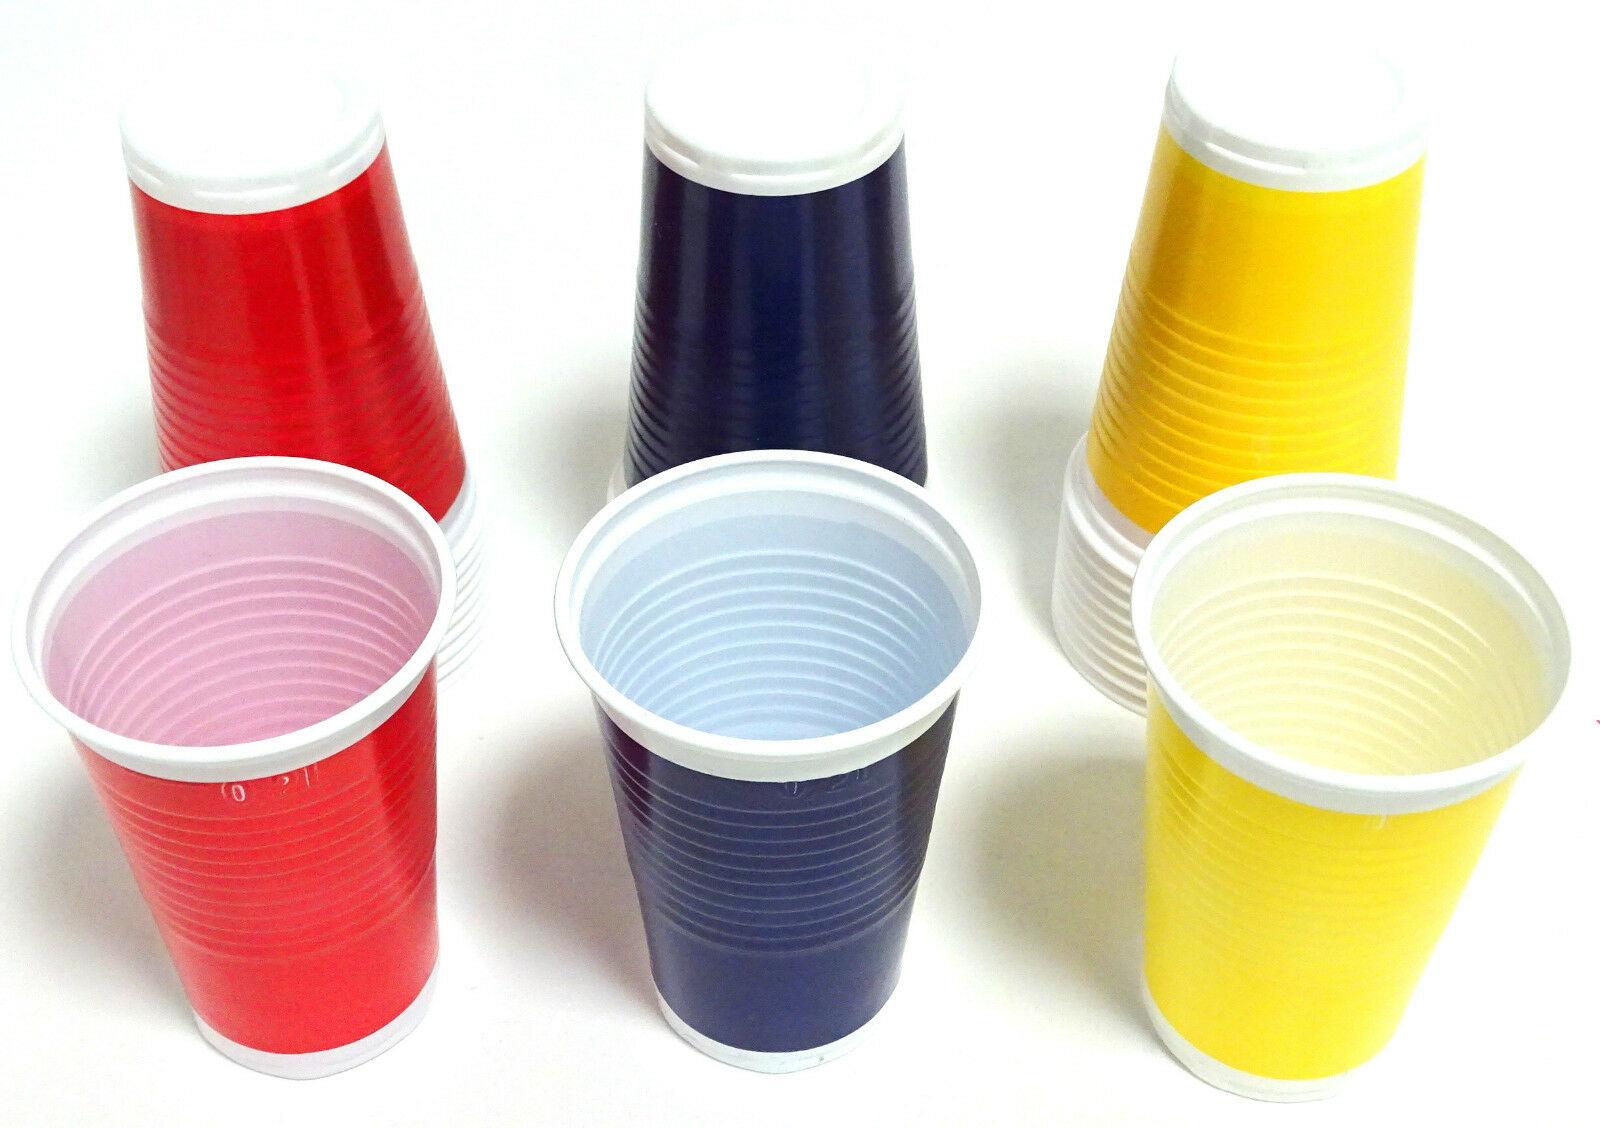 200-3.000 Plastikbecher Einwegbecher 0,2 l Trinkbecher Rot Gelb Blau ab 0,03€/St - 1.000 Stück, Mix (Rot /Gelb / Dunkelblau)